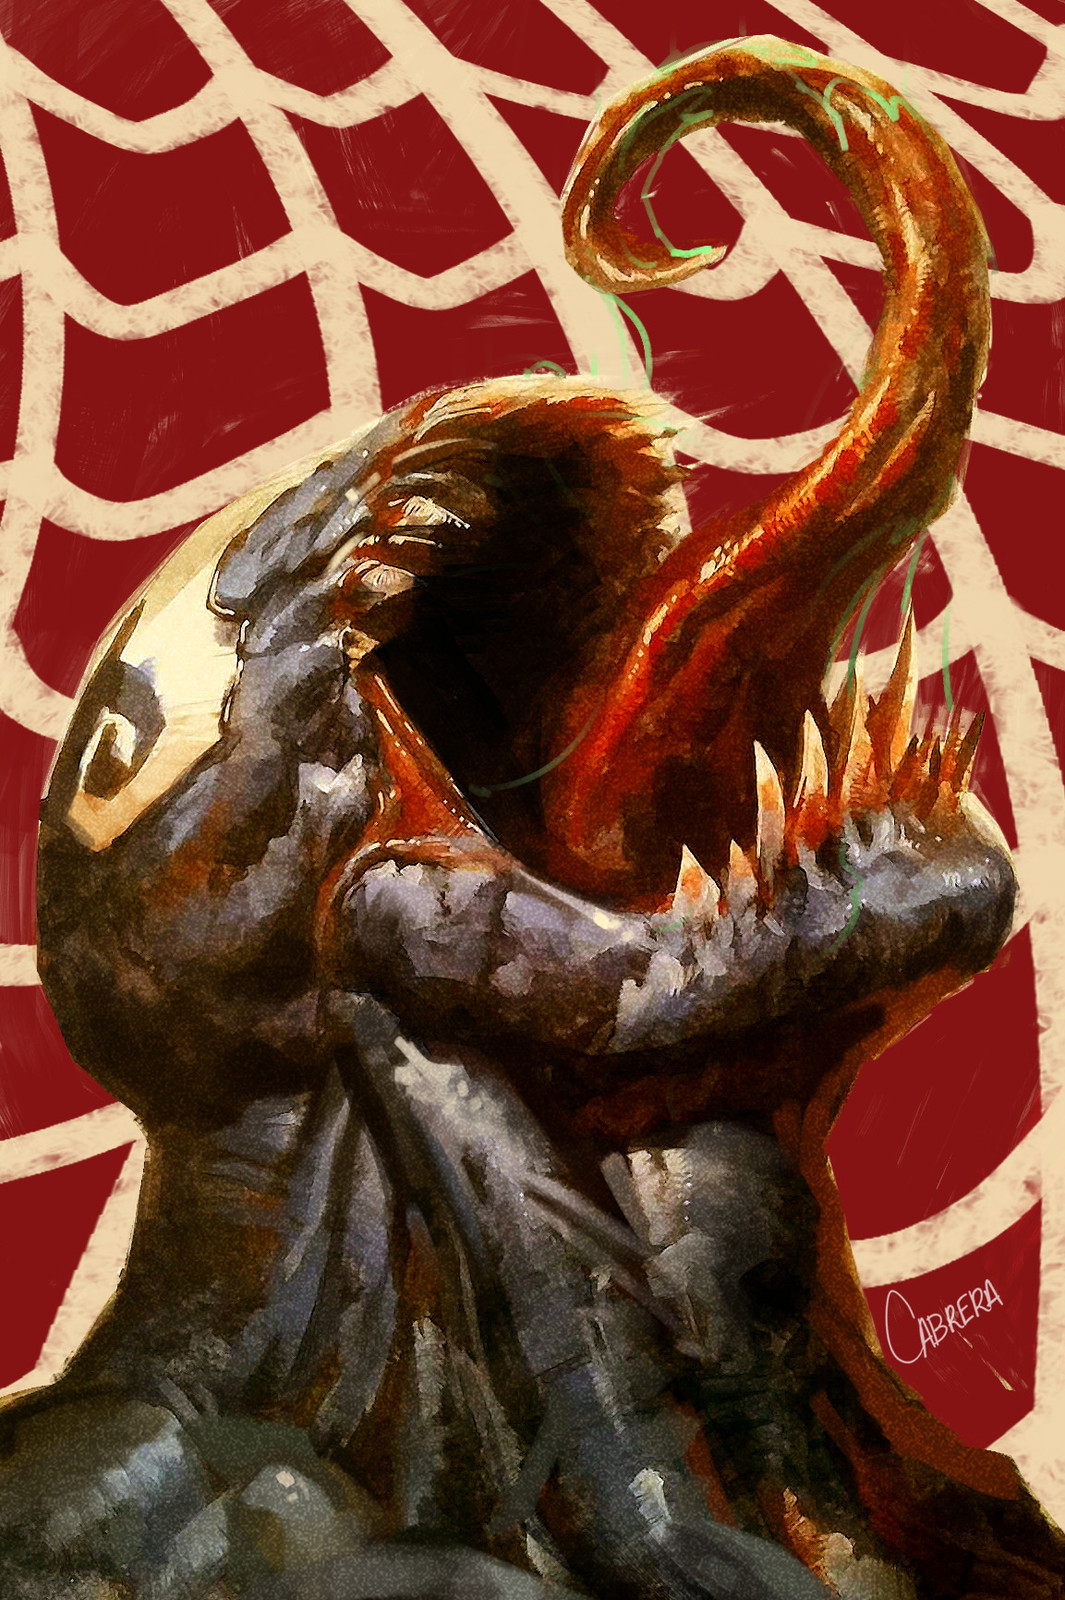 Rework Venom